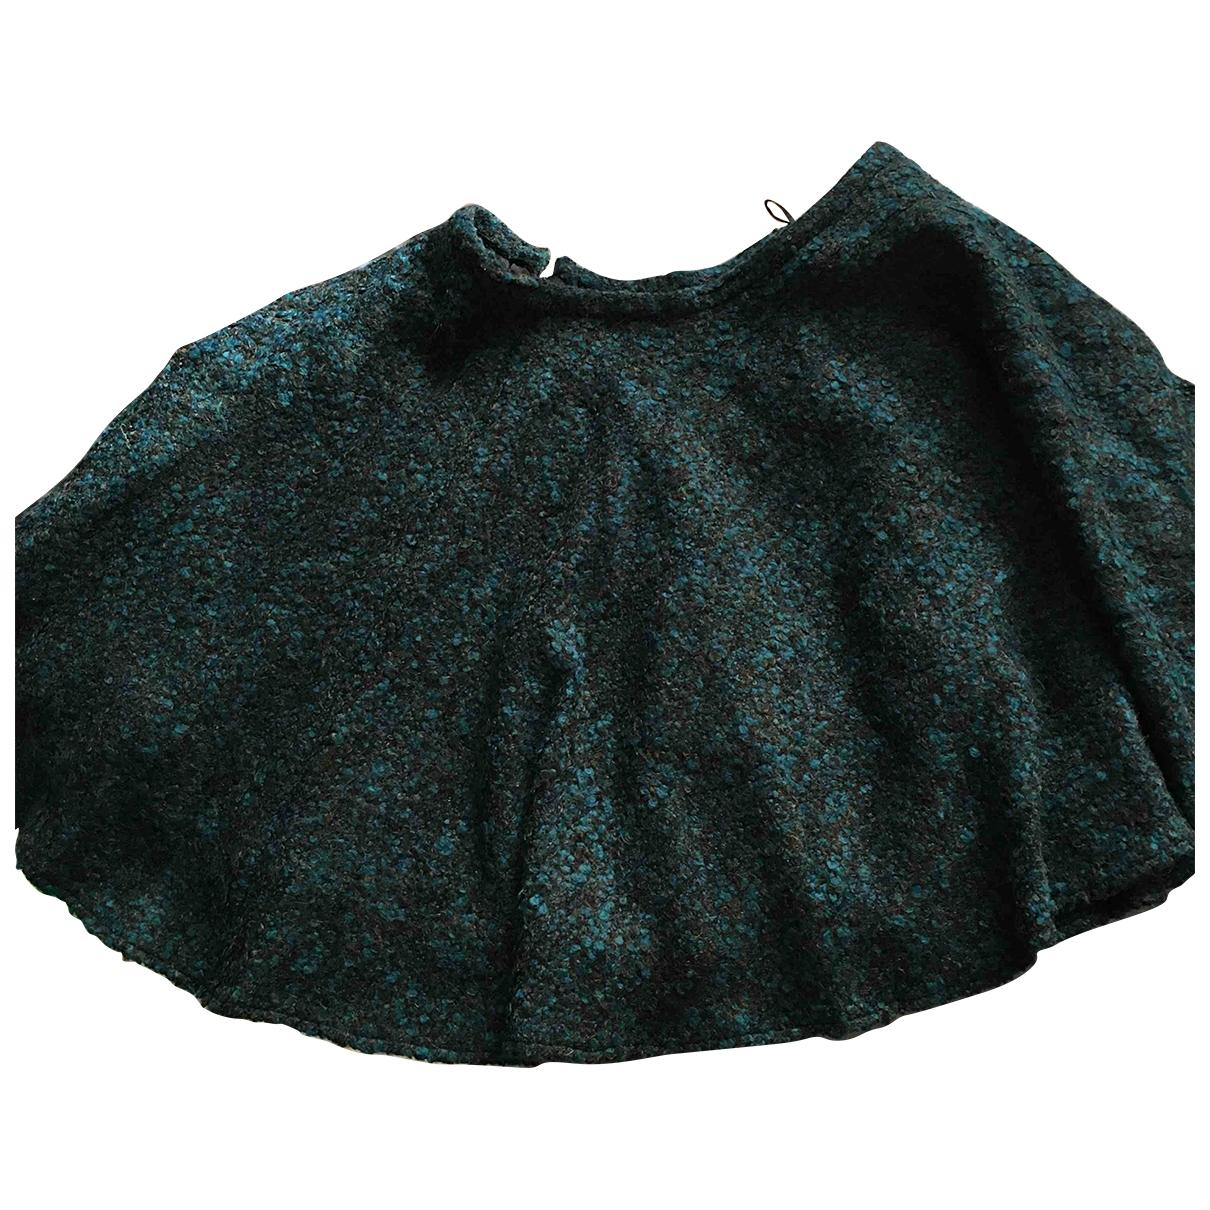 Kenzo - Jupe   pour femme en laine - vert